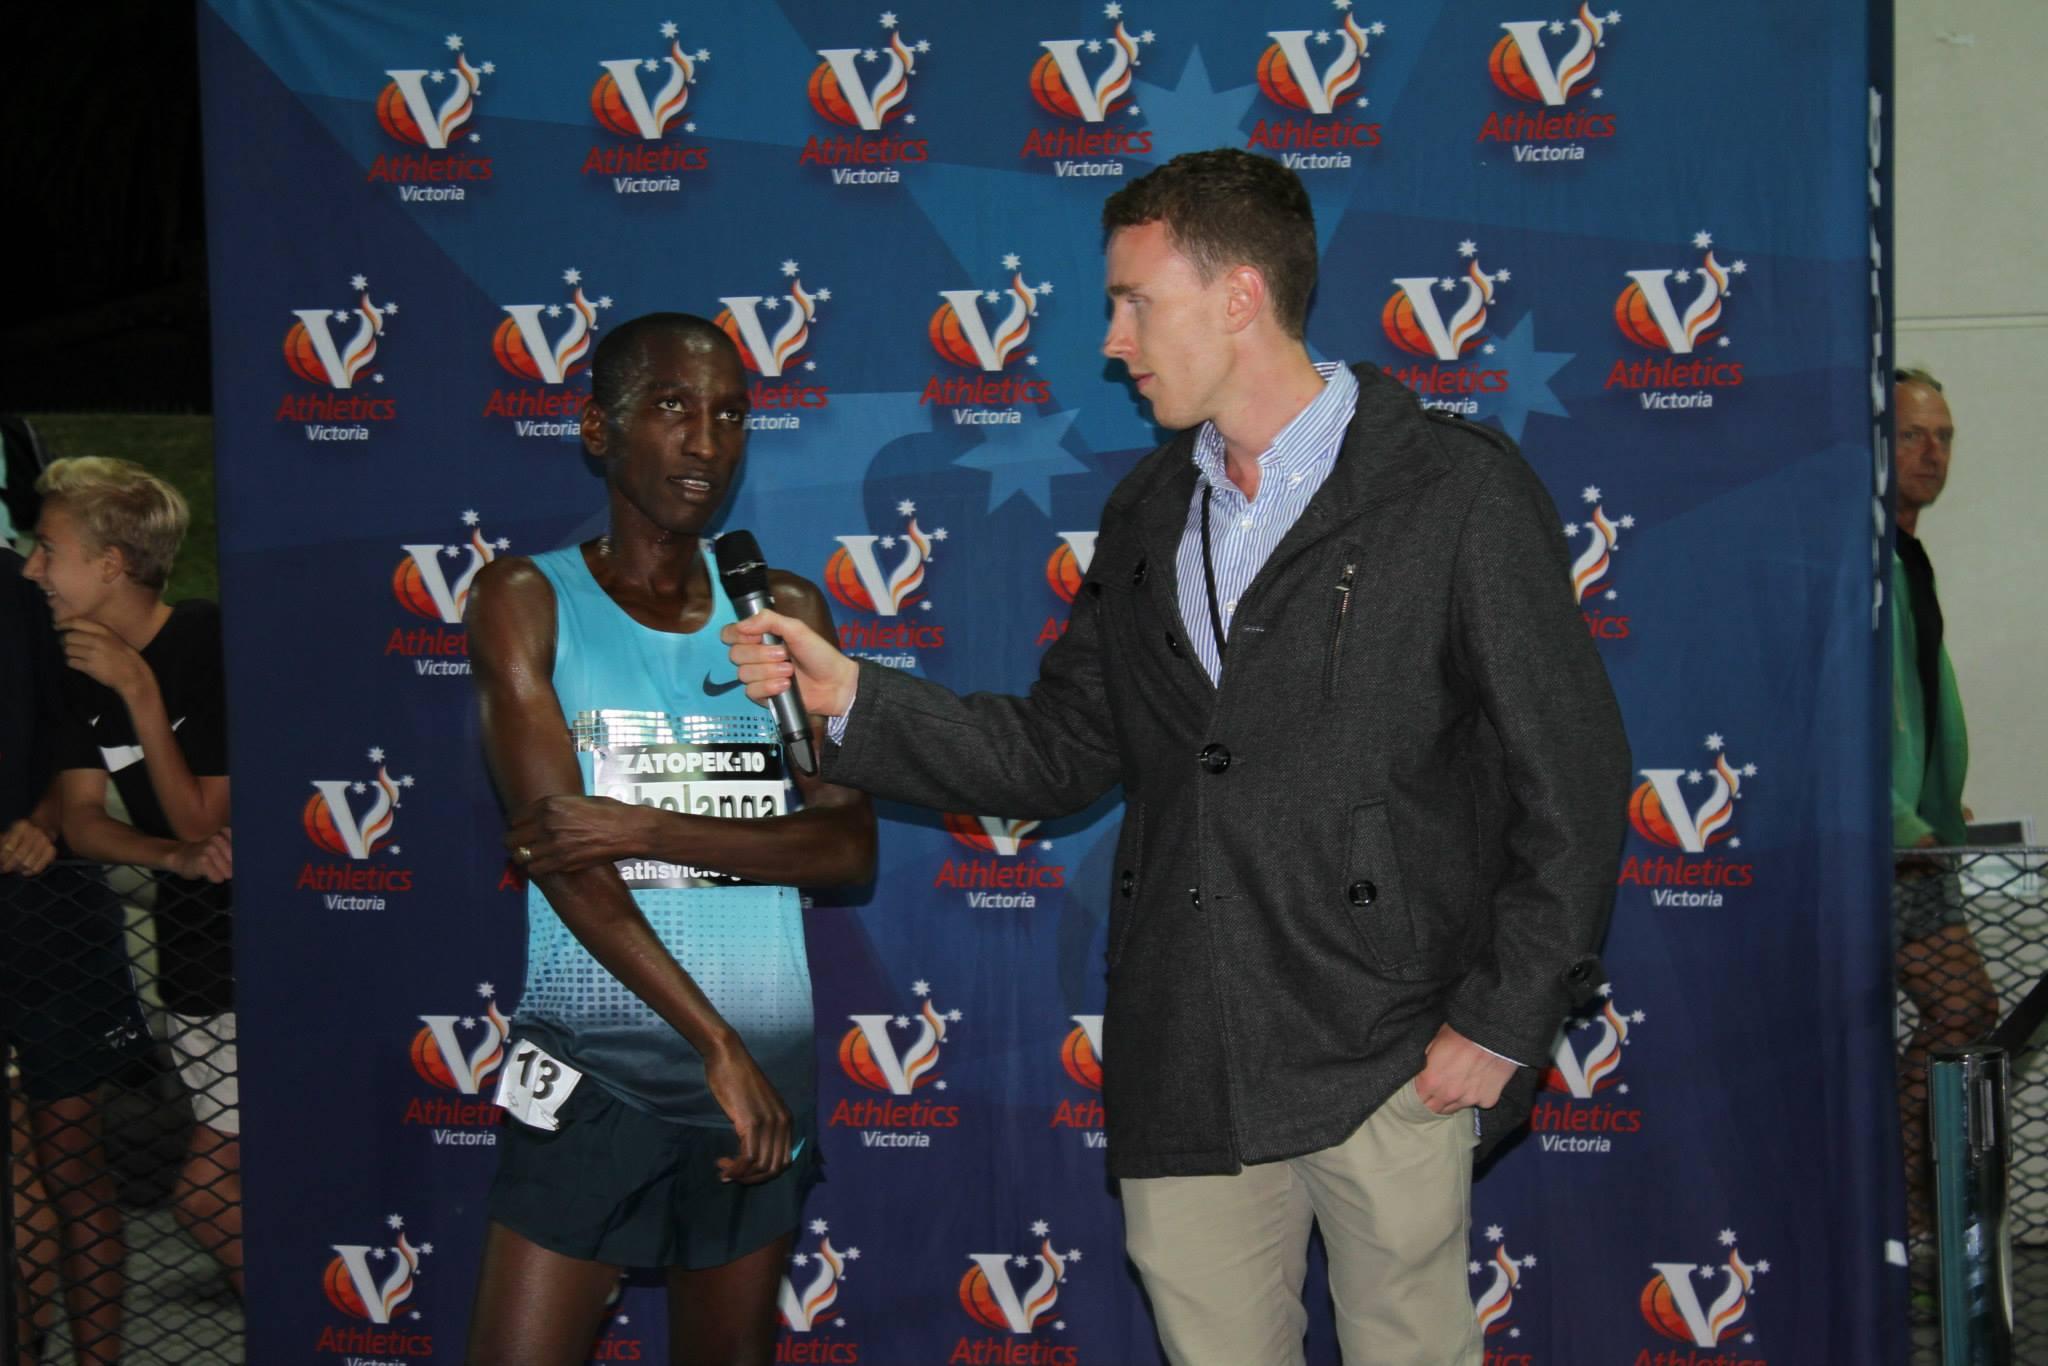 samchelanga Athletes Exclusive with Sam Chelanga Athletes Exclusive with Sam Chelanga samchelanga